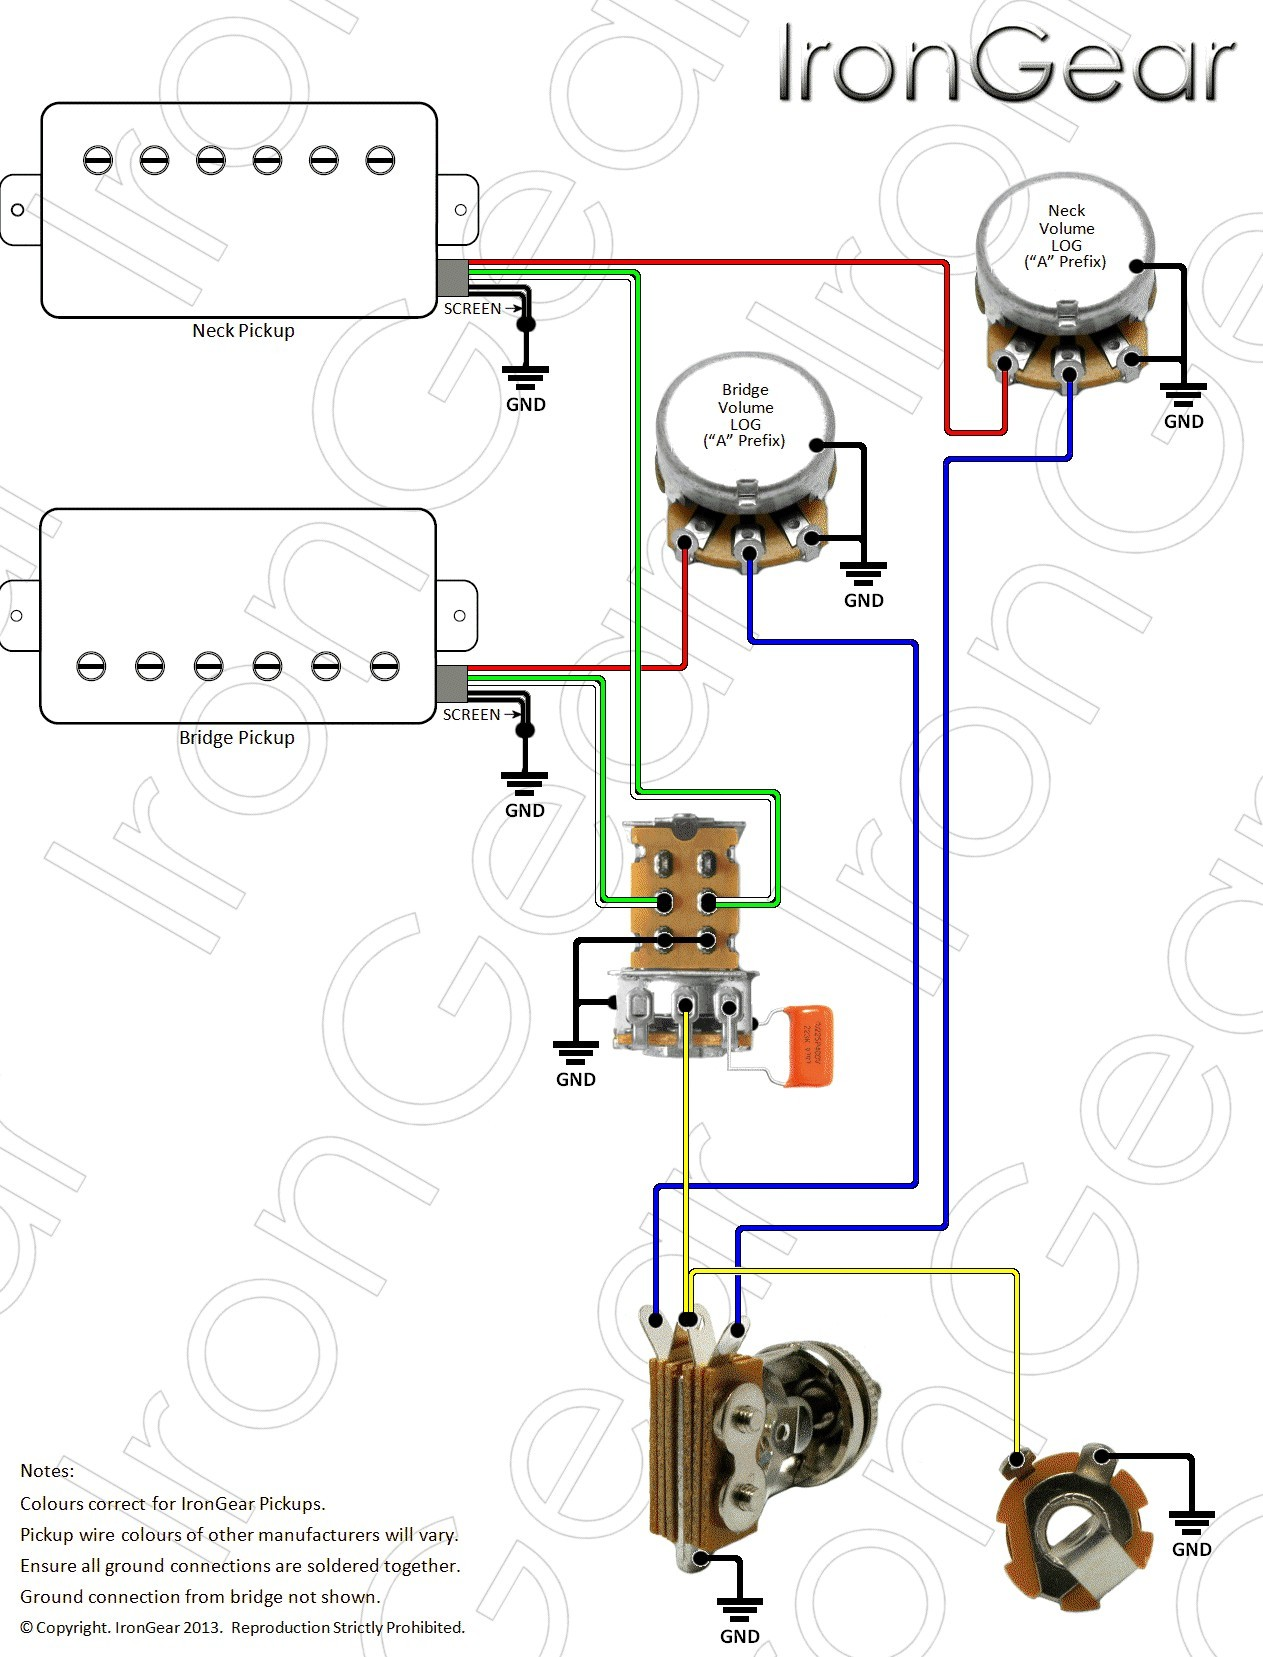 Active Guitar Wiring Diagram New Emg Wiring Diagram Copy Emg Wiring Diagram 81 85 2 Volume 1 Tone